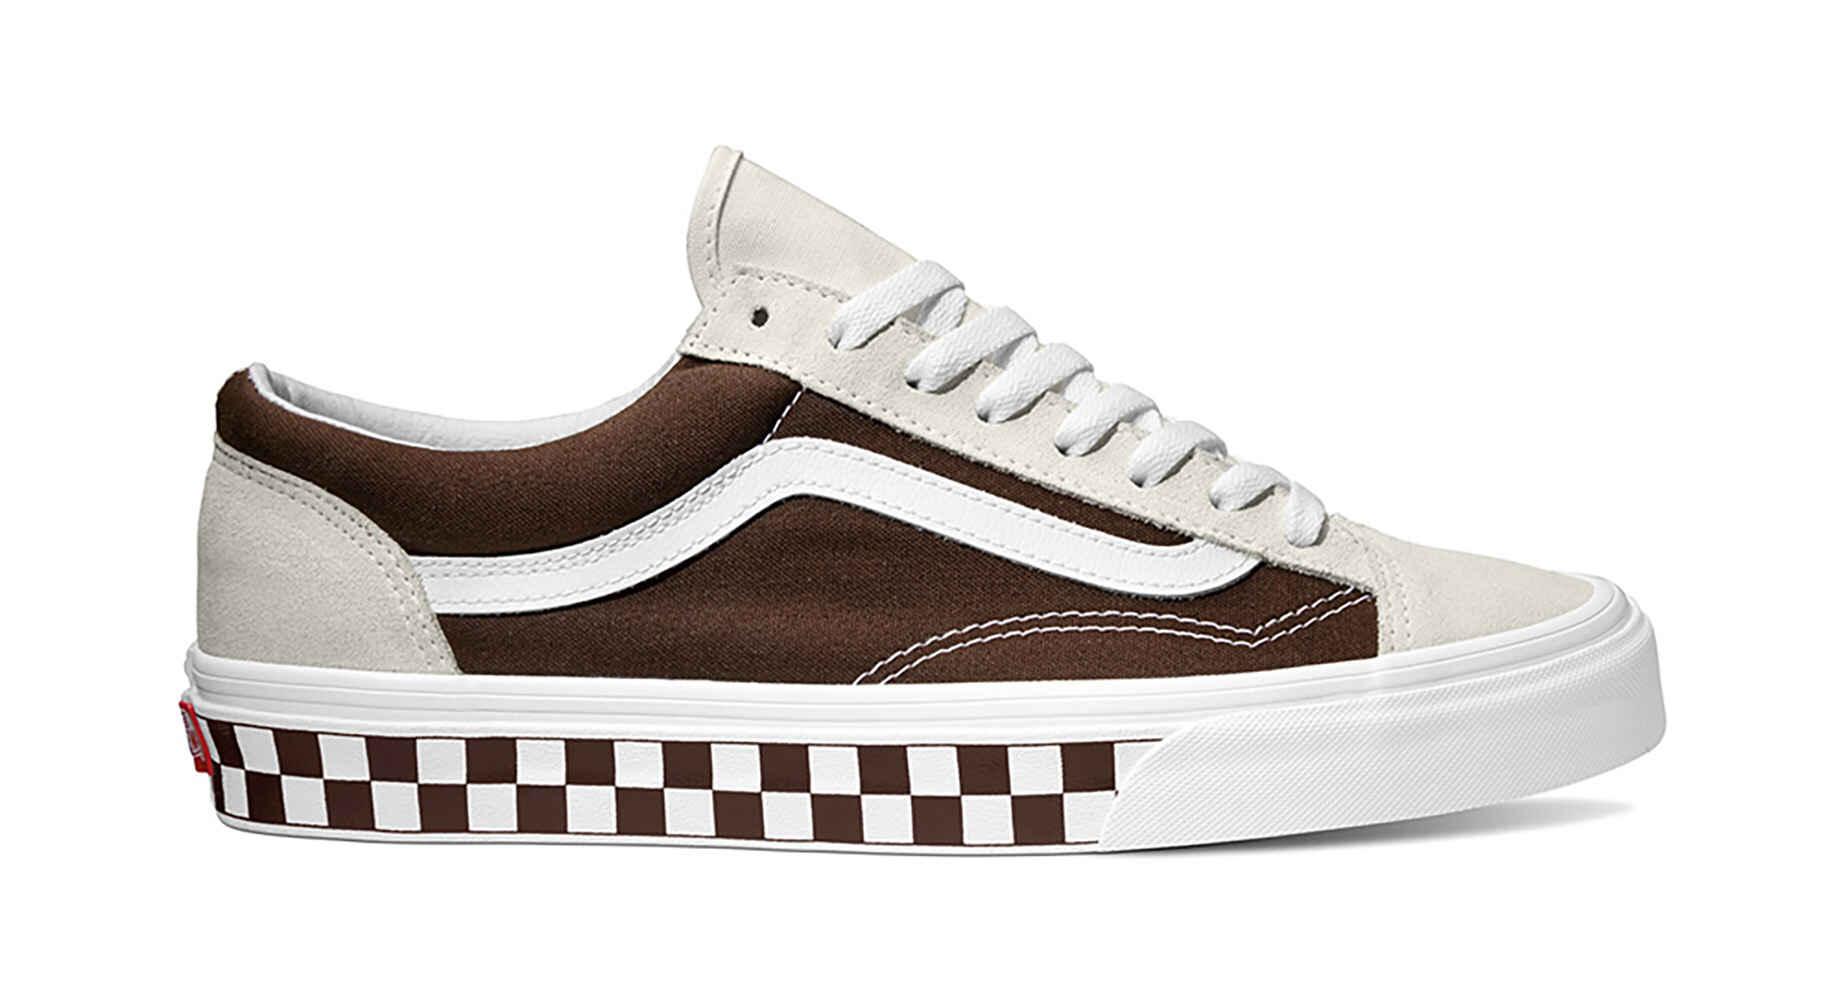 56bdab9f228ee6 WHITEBROWN 36 Footwear CHECKERBOARD SHOE STYLE BMX VANS Shoes XZCqxS5w